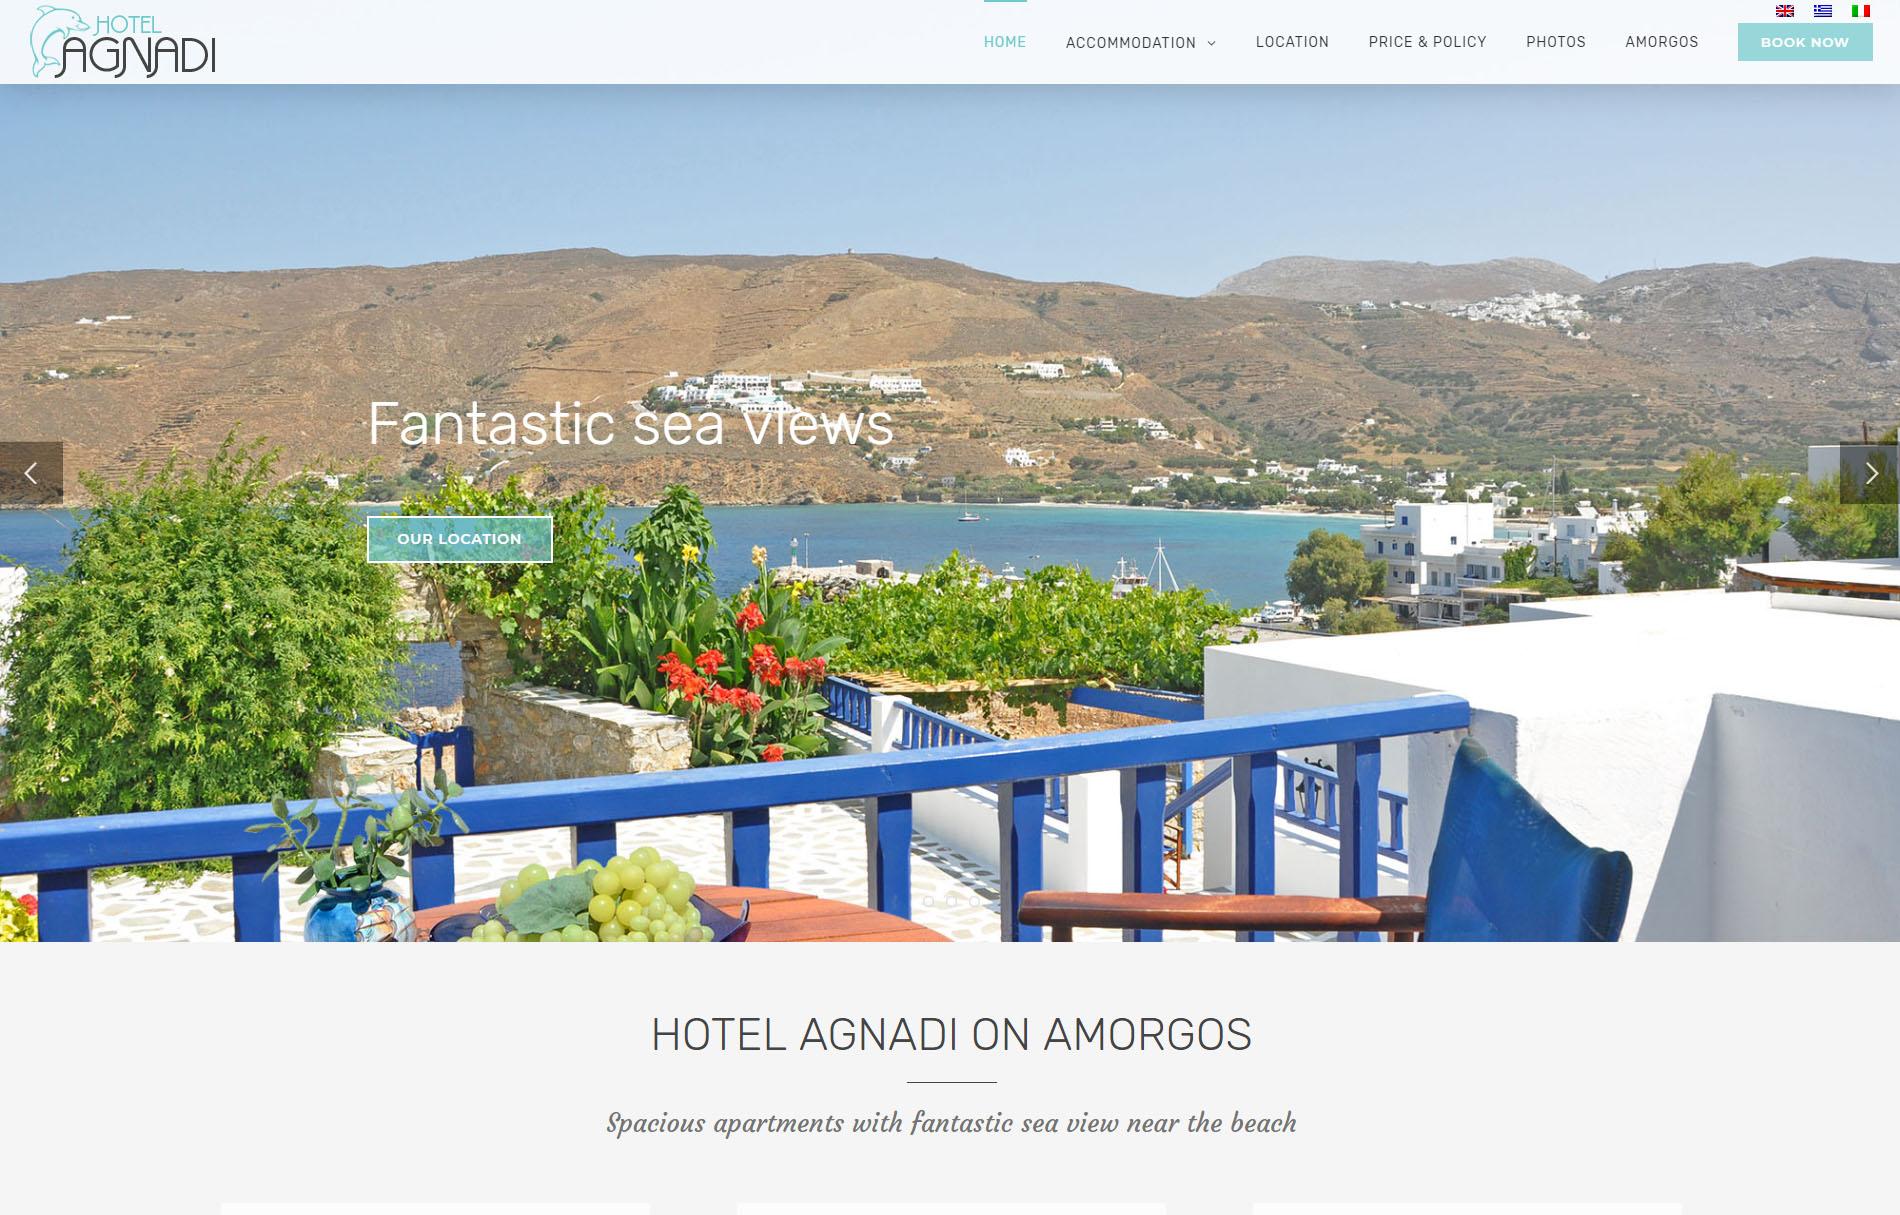 Hotell Agnadi Amorgos